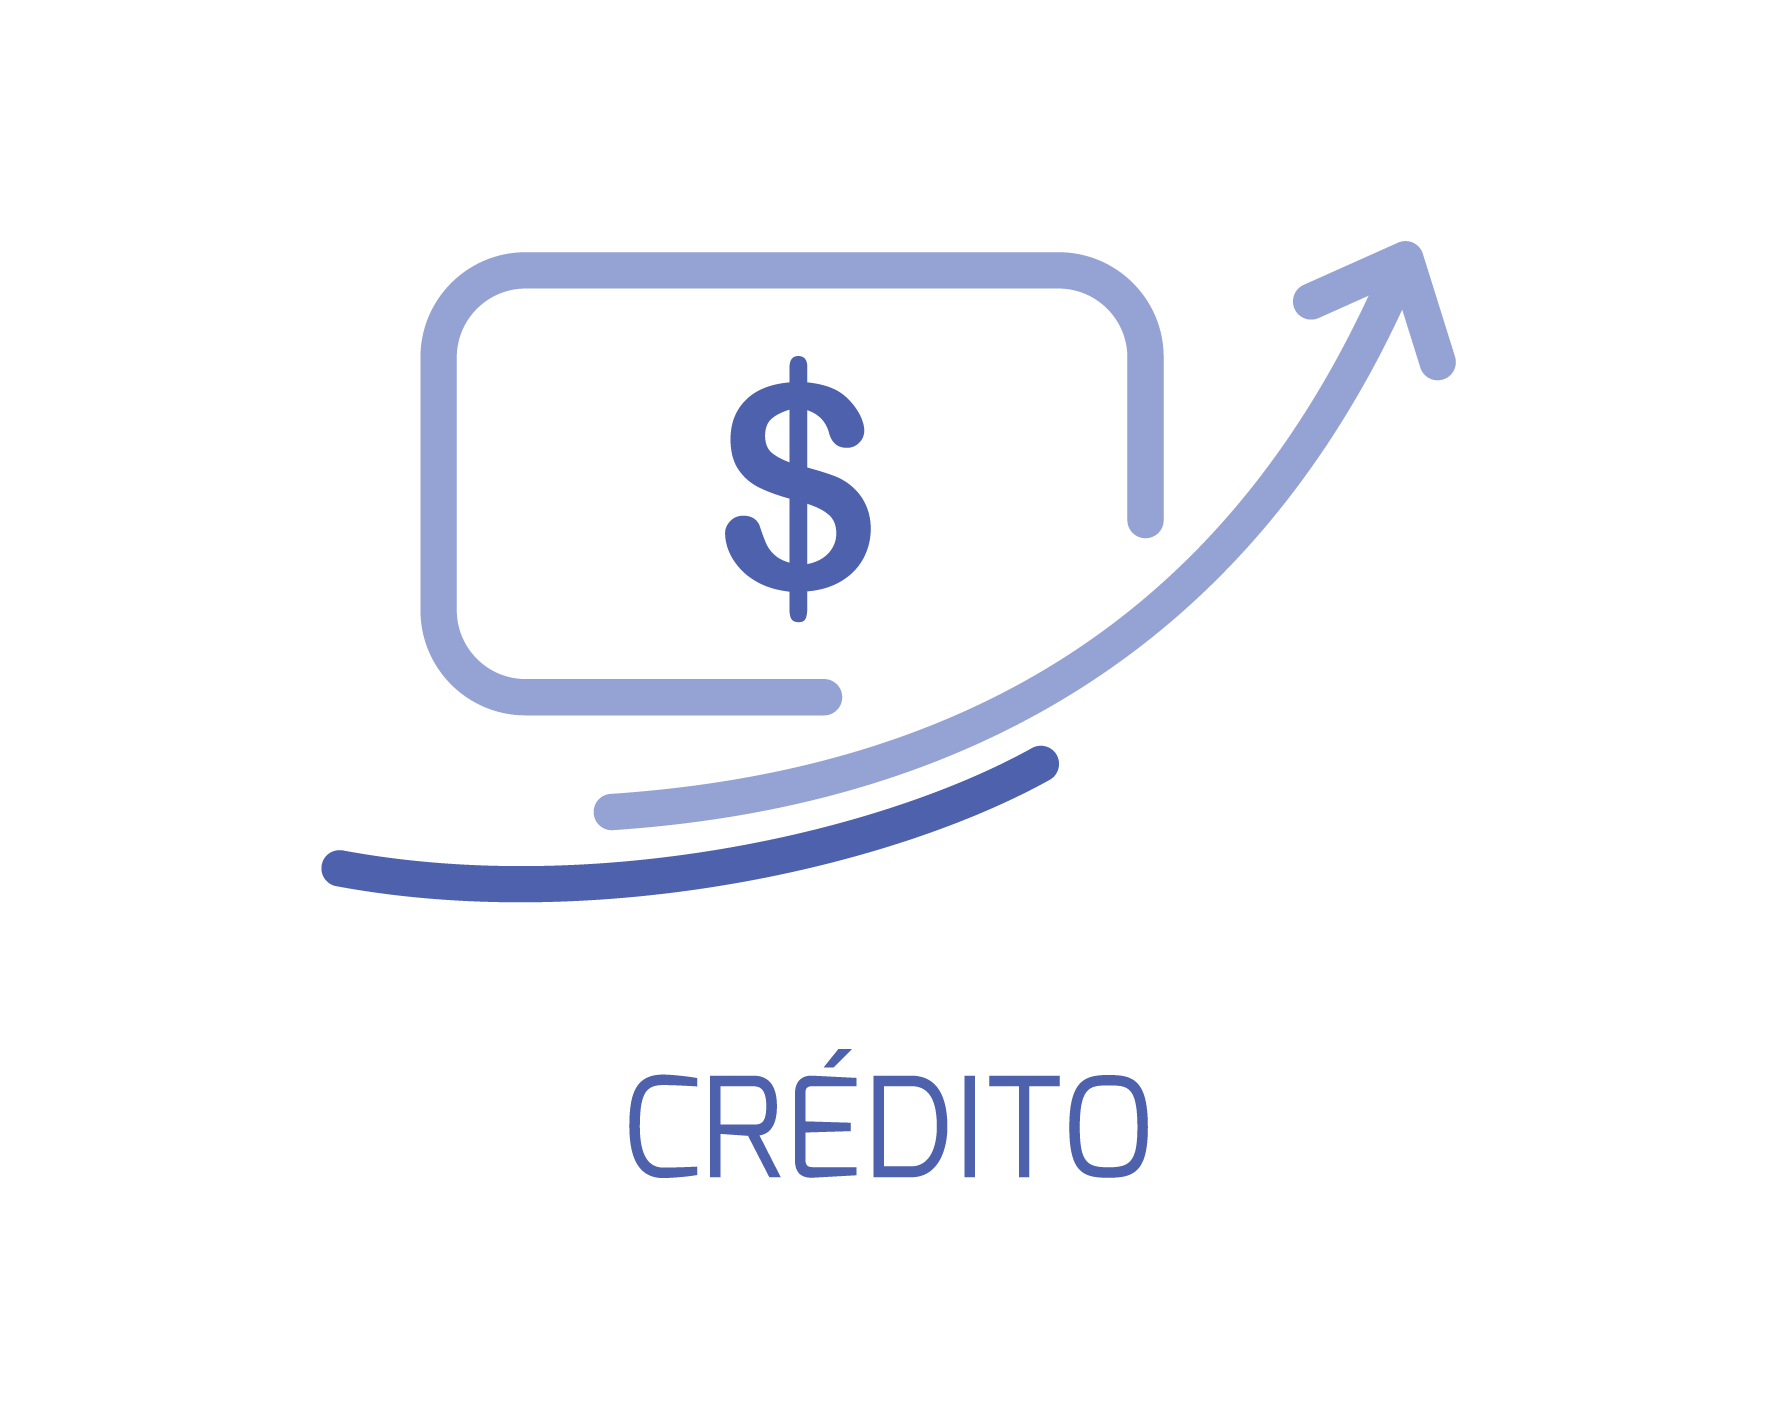 sistema financeiro 20 02 2020